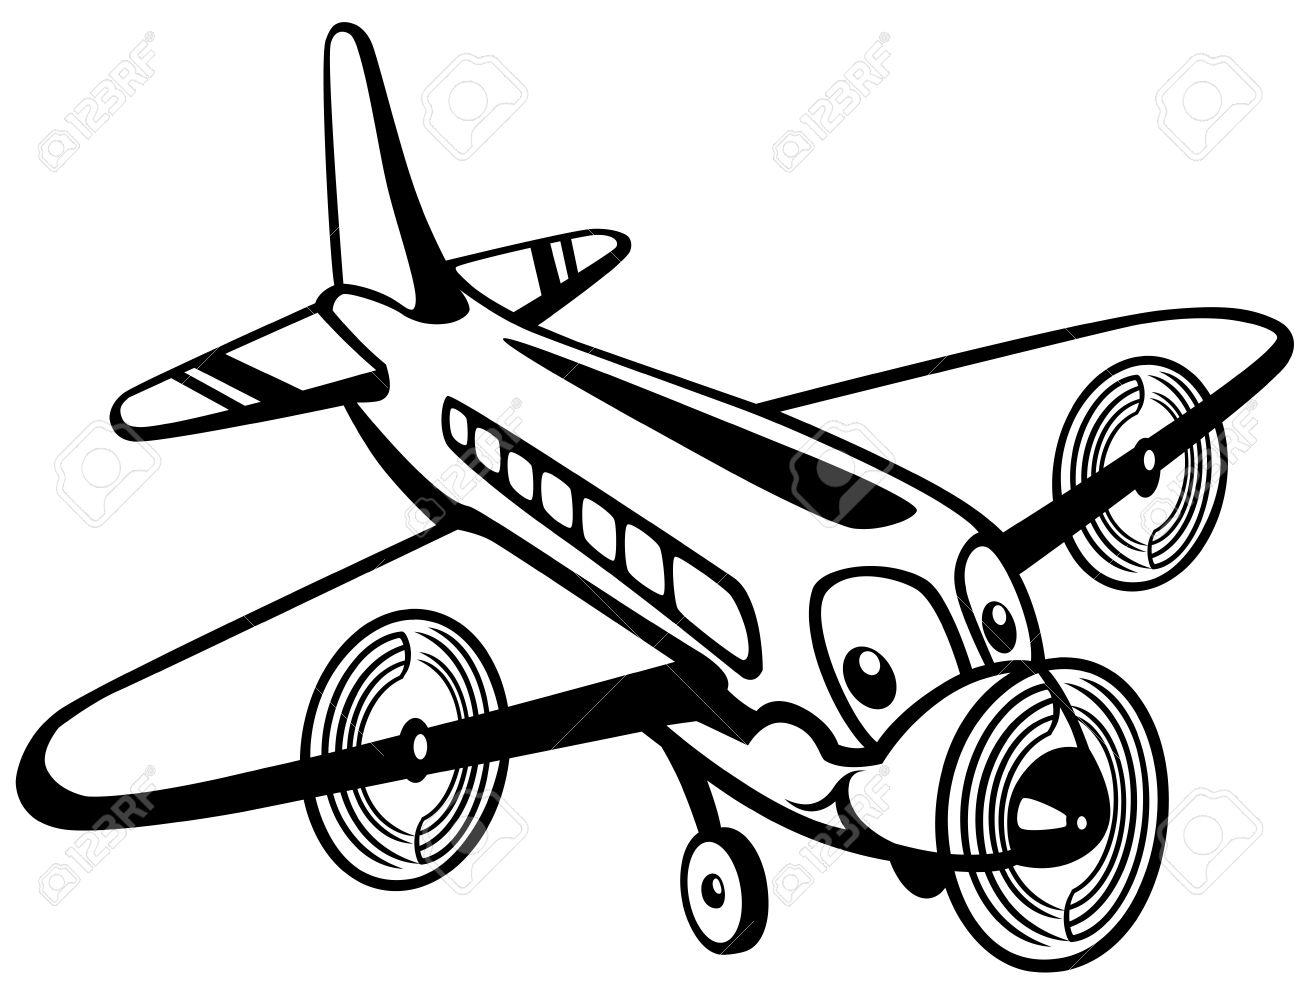 1300x996 Airplane Clipart Boy Toy